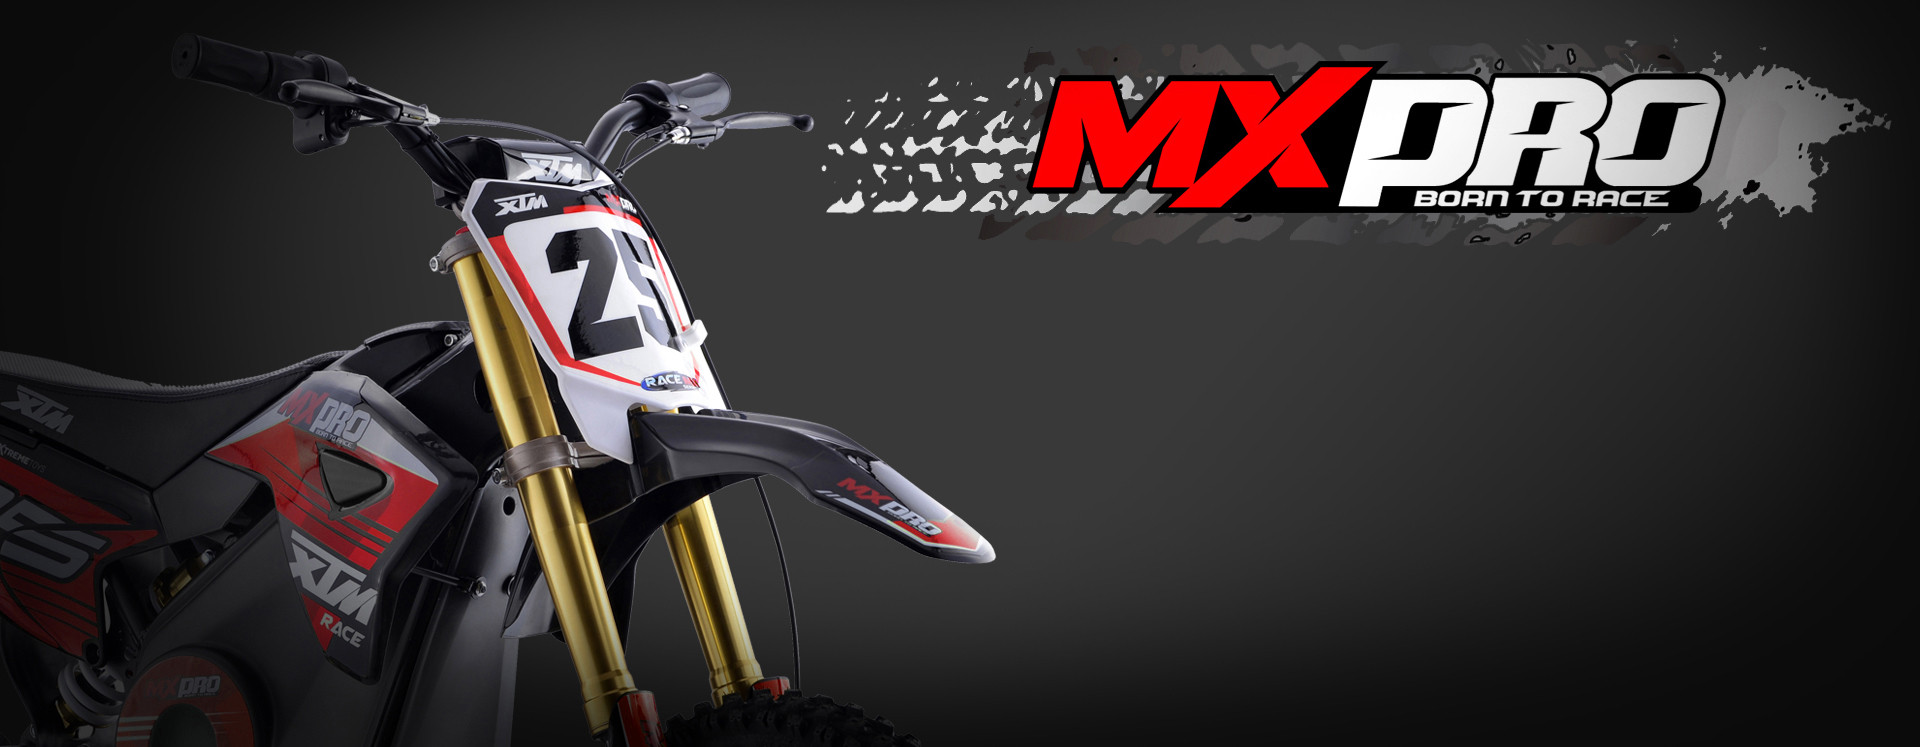 XTM MX-PRO 36V 1100W LITHIUM DIRT BIKE RED